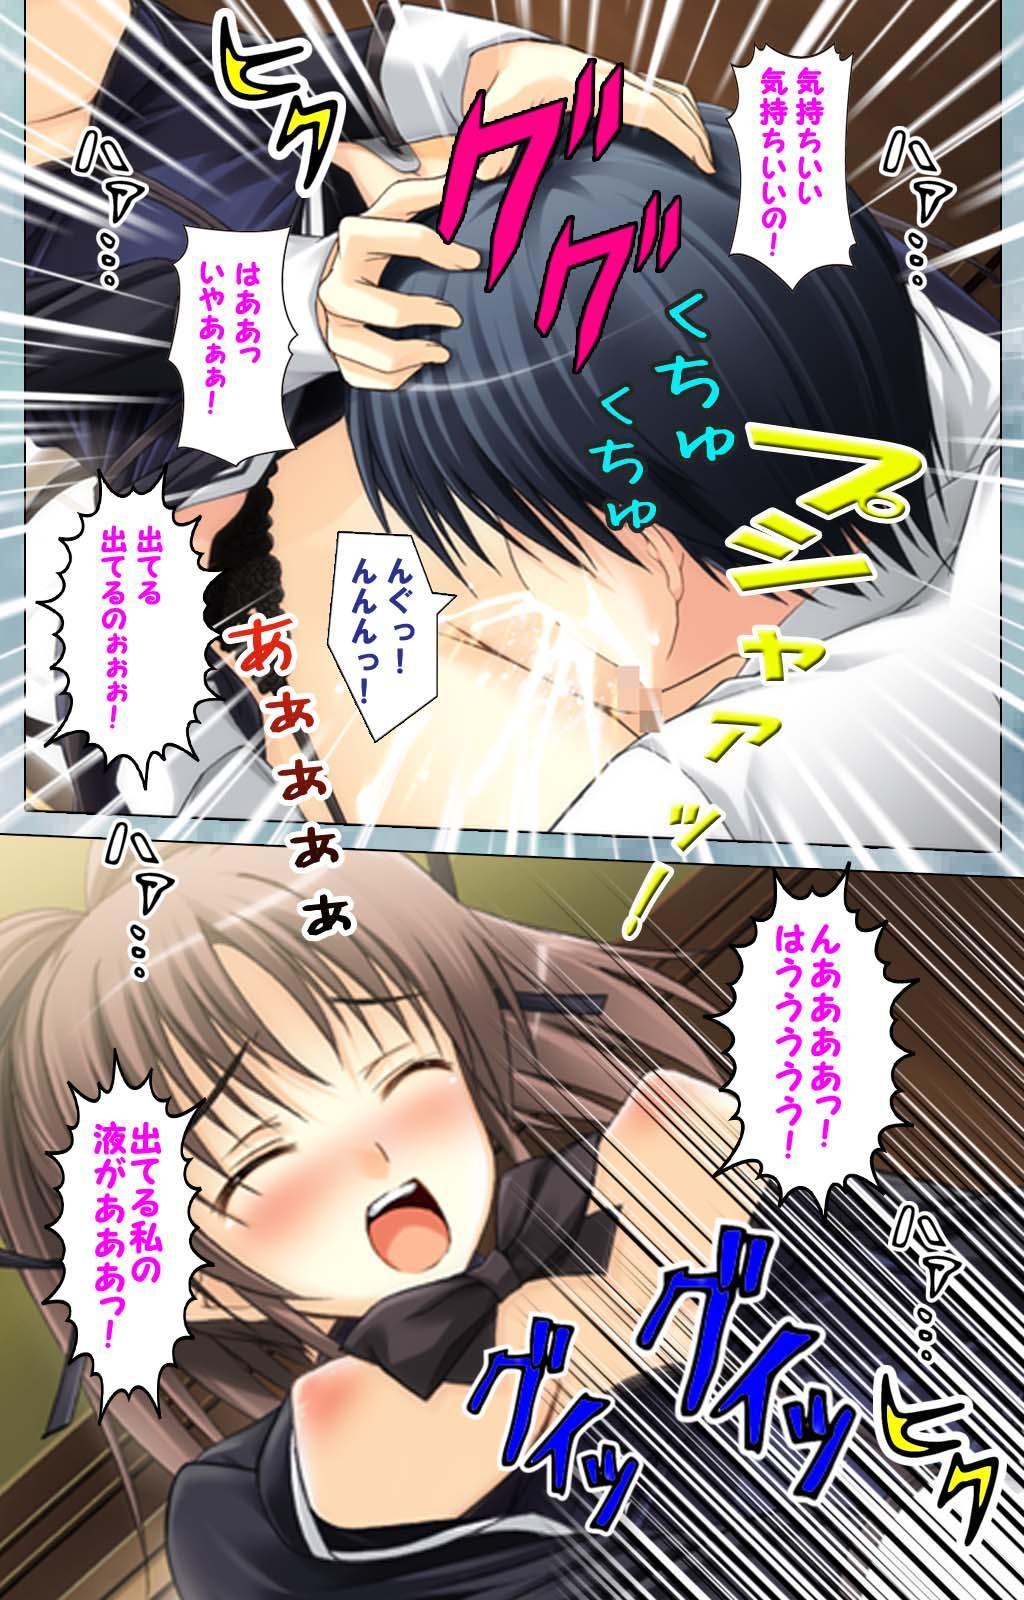 [Applemint] [Full Color seijin ban] Bijin shimai no yuwaku ~ himegoto ni oboreru otoko ~ Complete ban 46